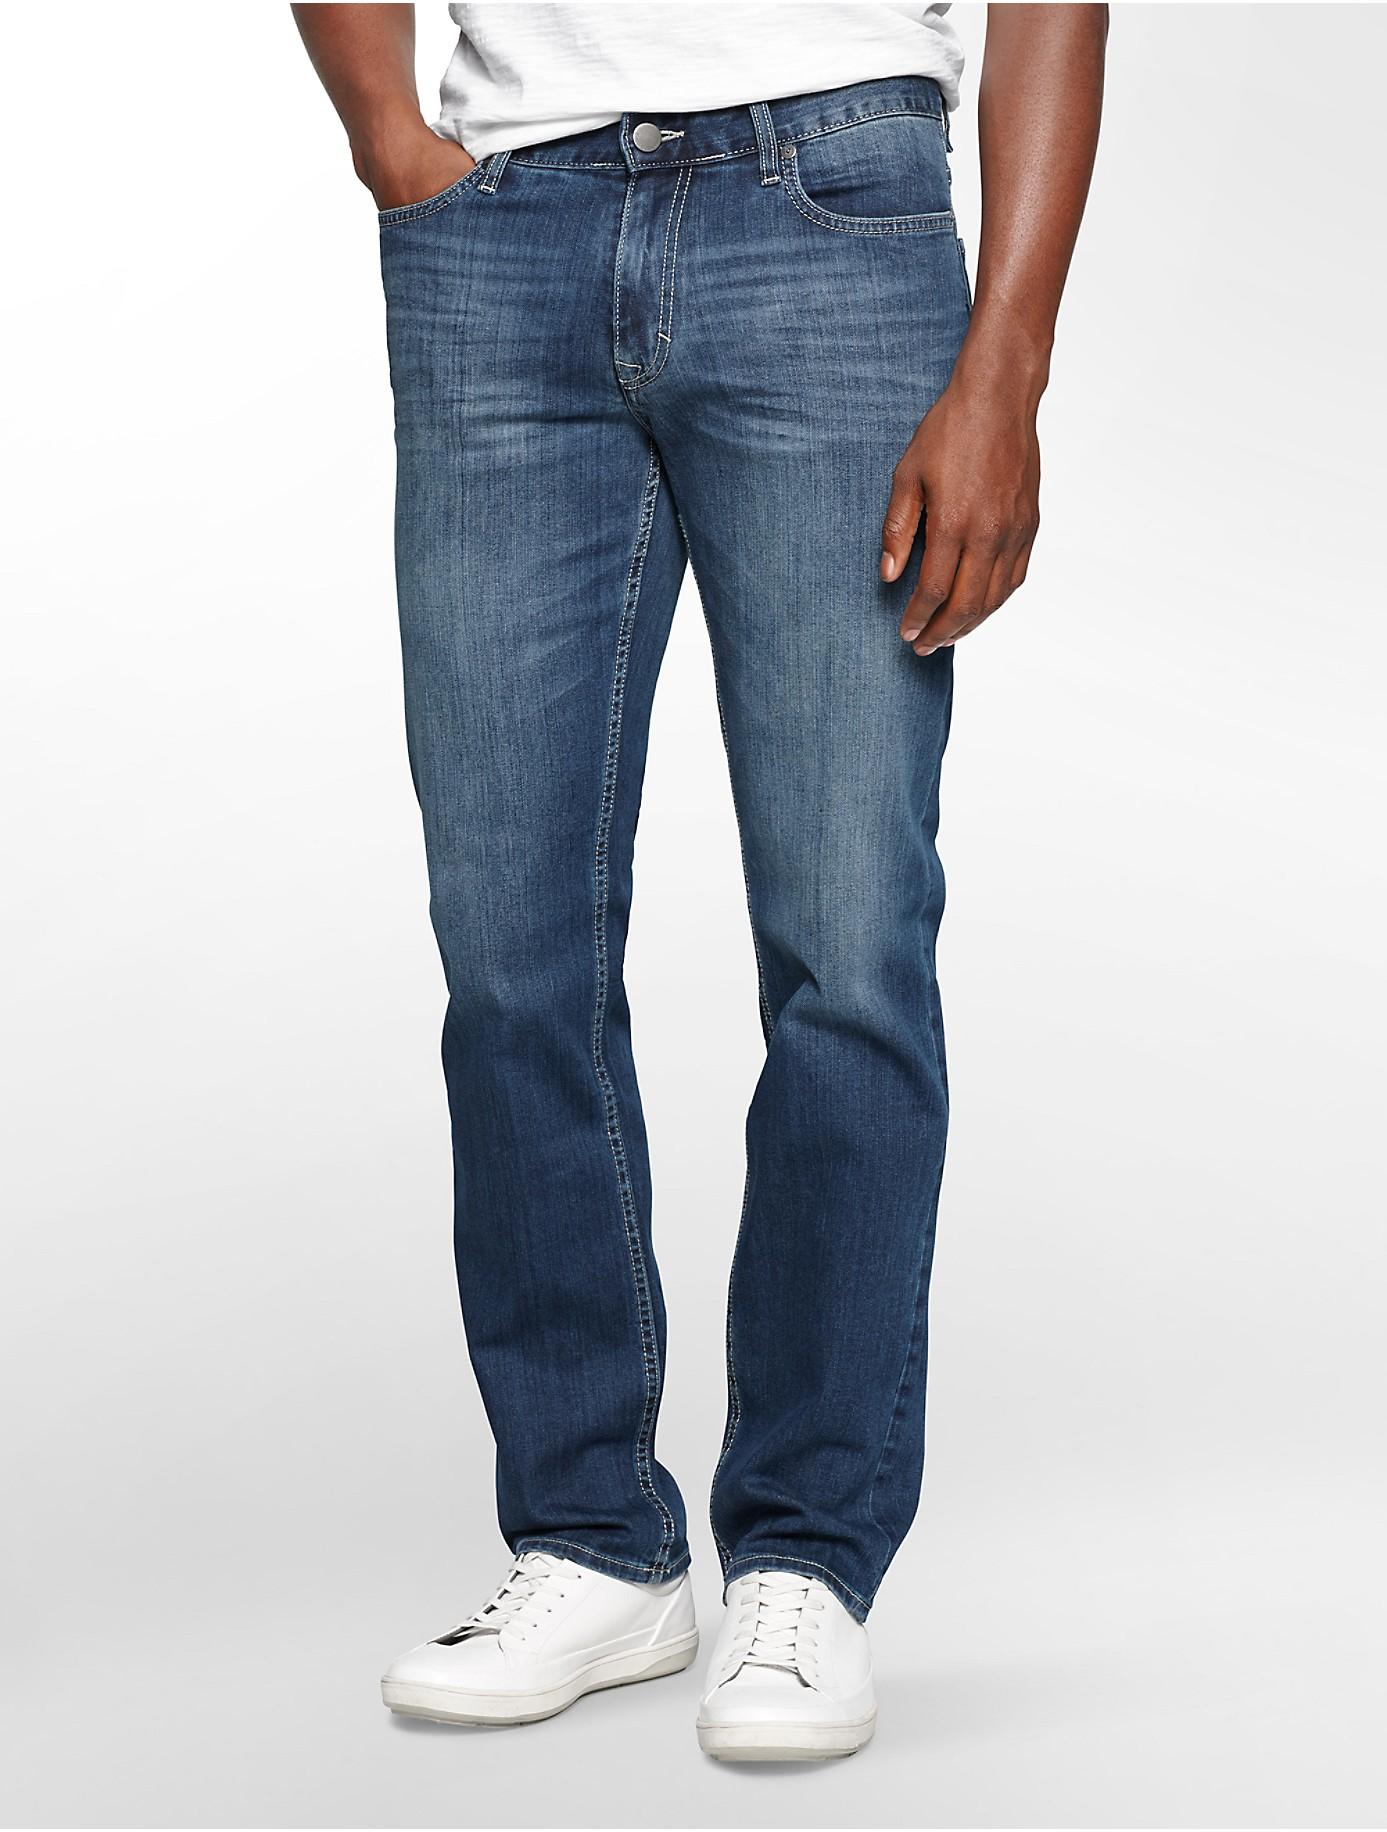 calvin klein jeans slim straight leg authentic blue wash. Black Bedroom Furniture Sets. Home Design Ideas